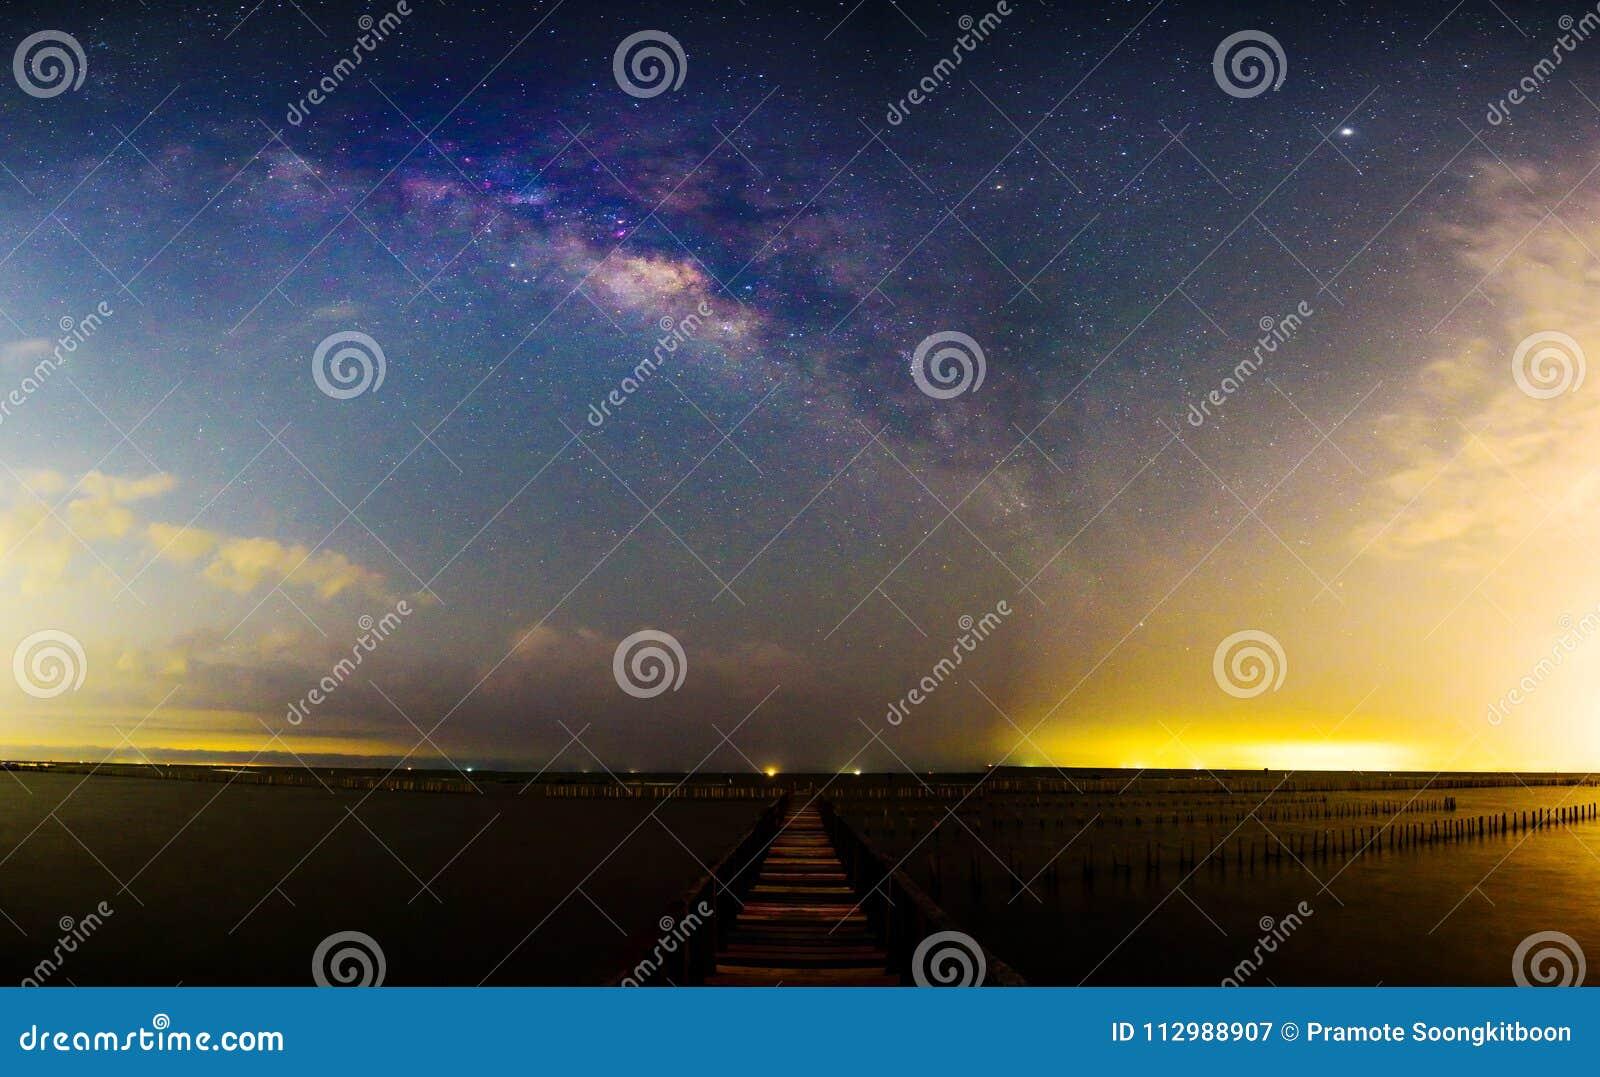 Panorama Milky way at the bridge